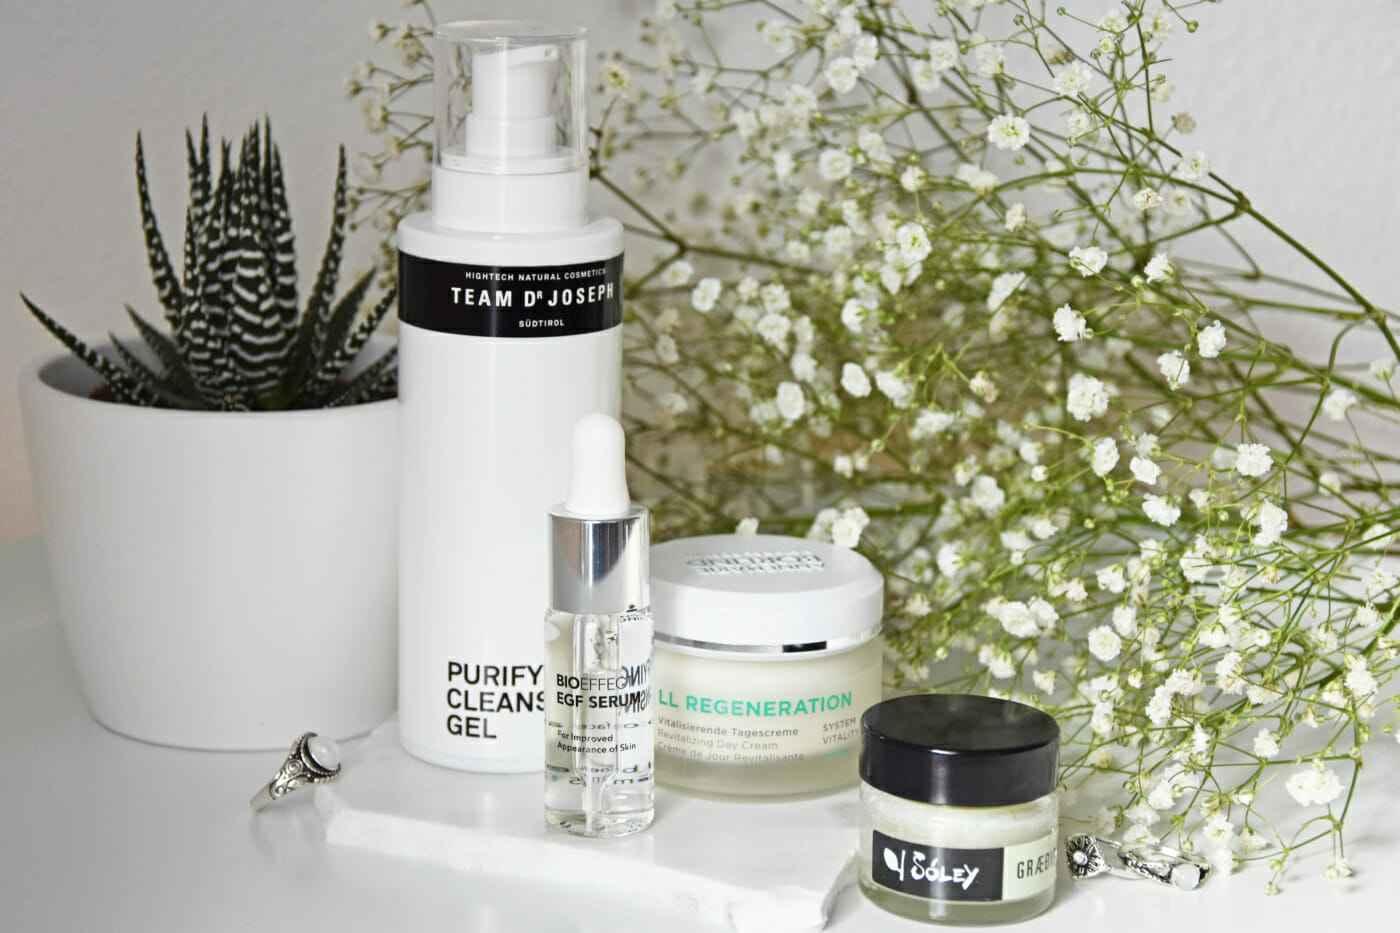 Naturkosmetik skin care